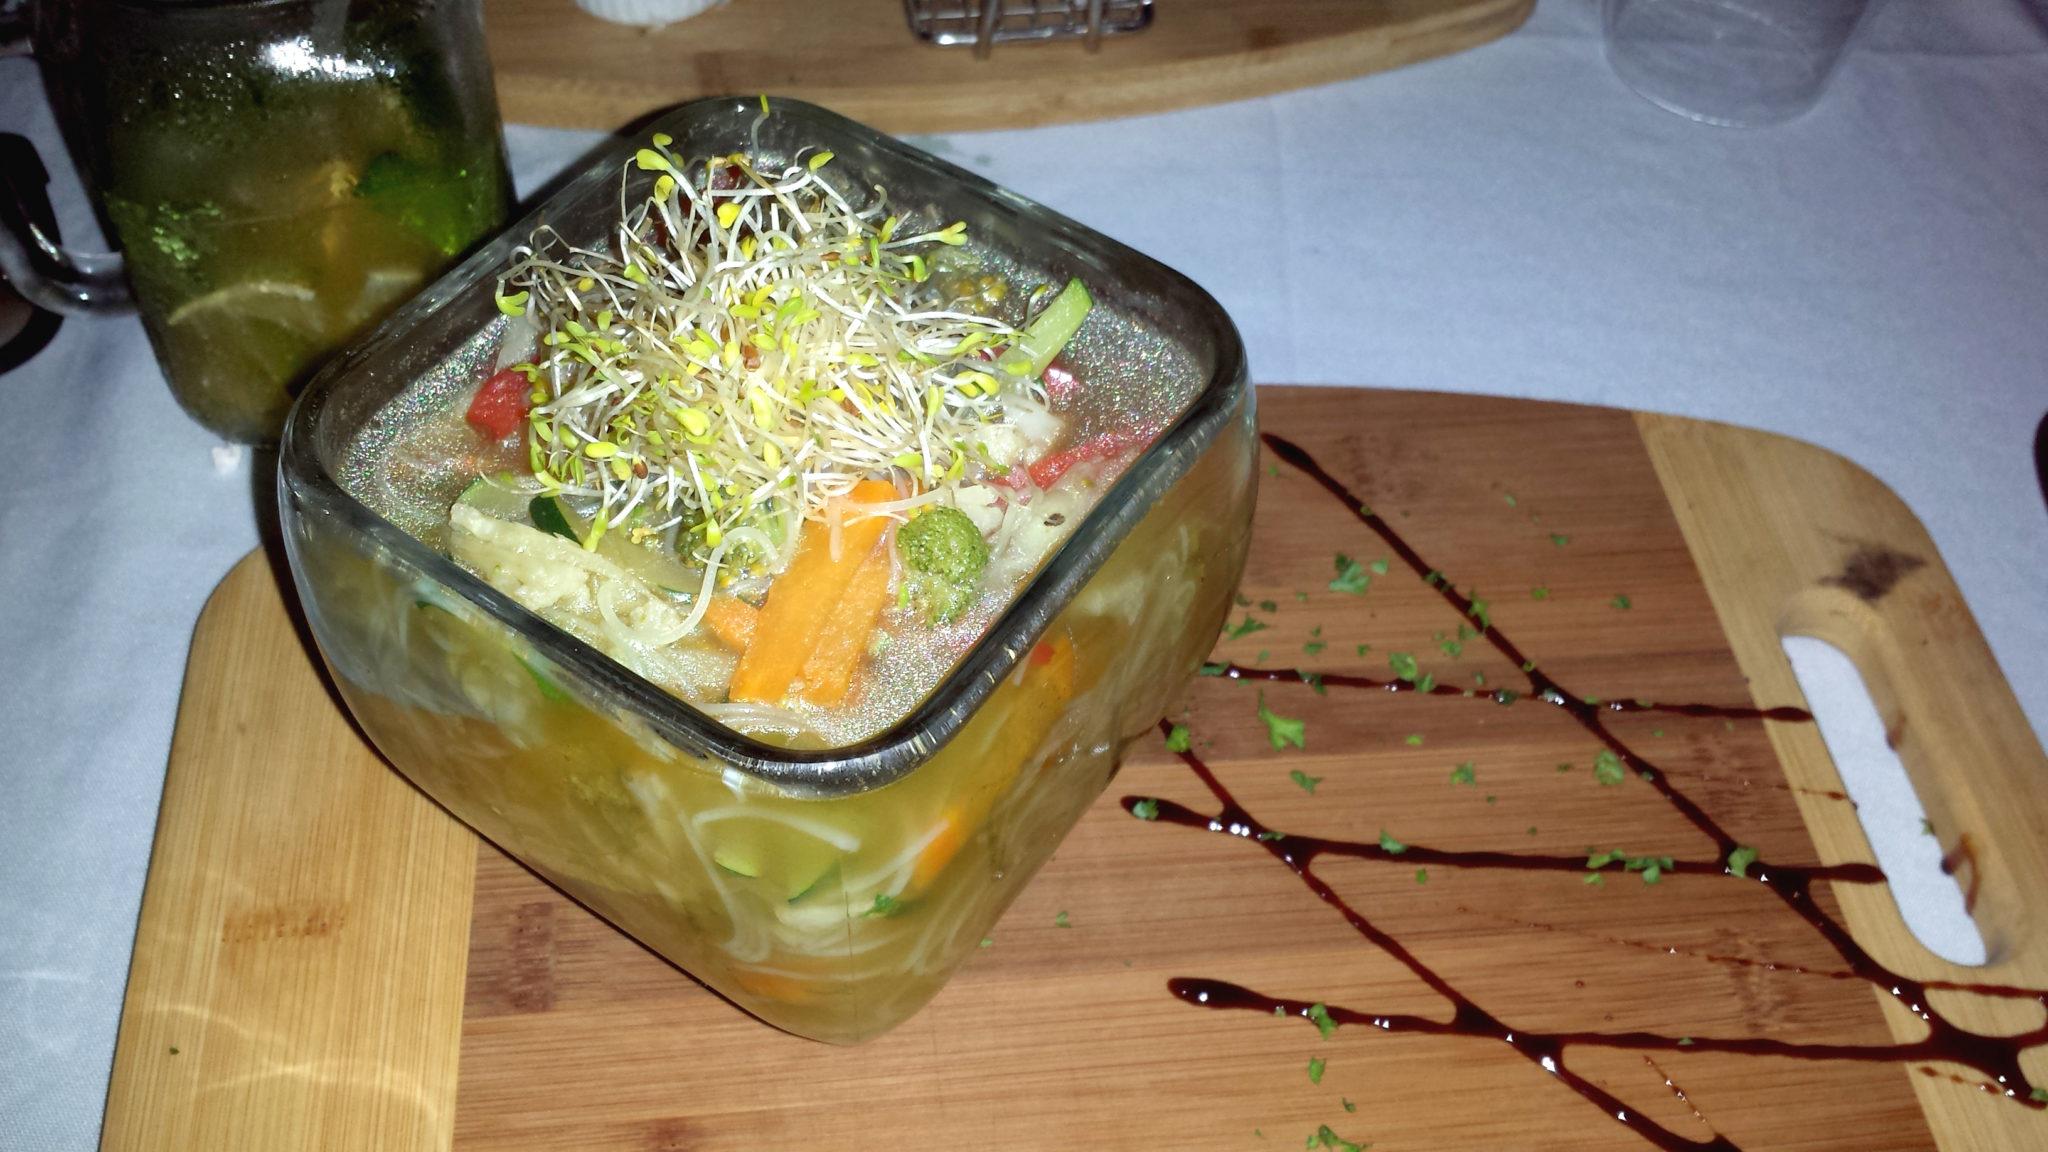 Republique_dominicaine_mes_bonnes_adresses_bayahibe_restaurant_saona_cafe_soupe_tonkinoise